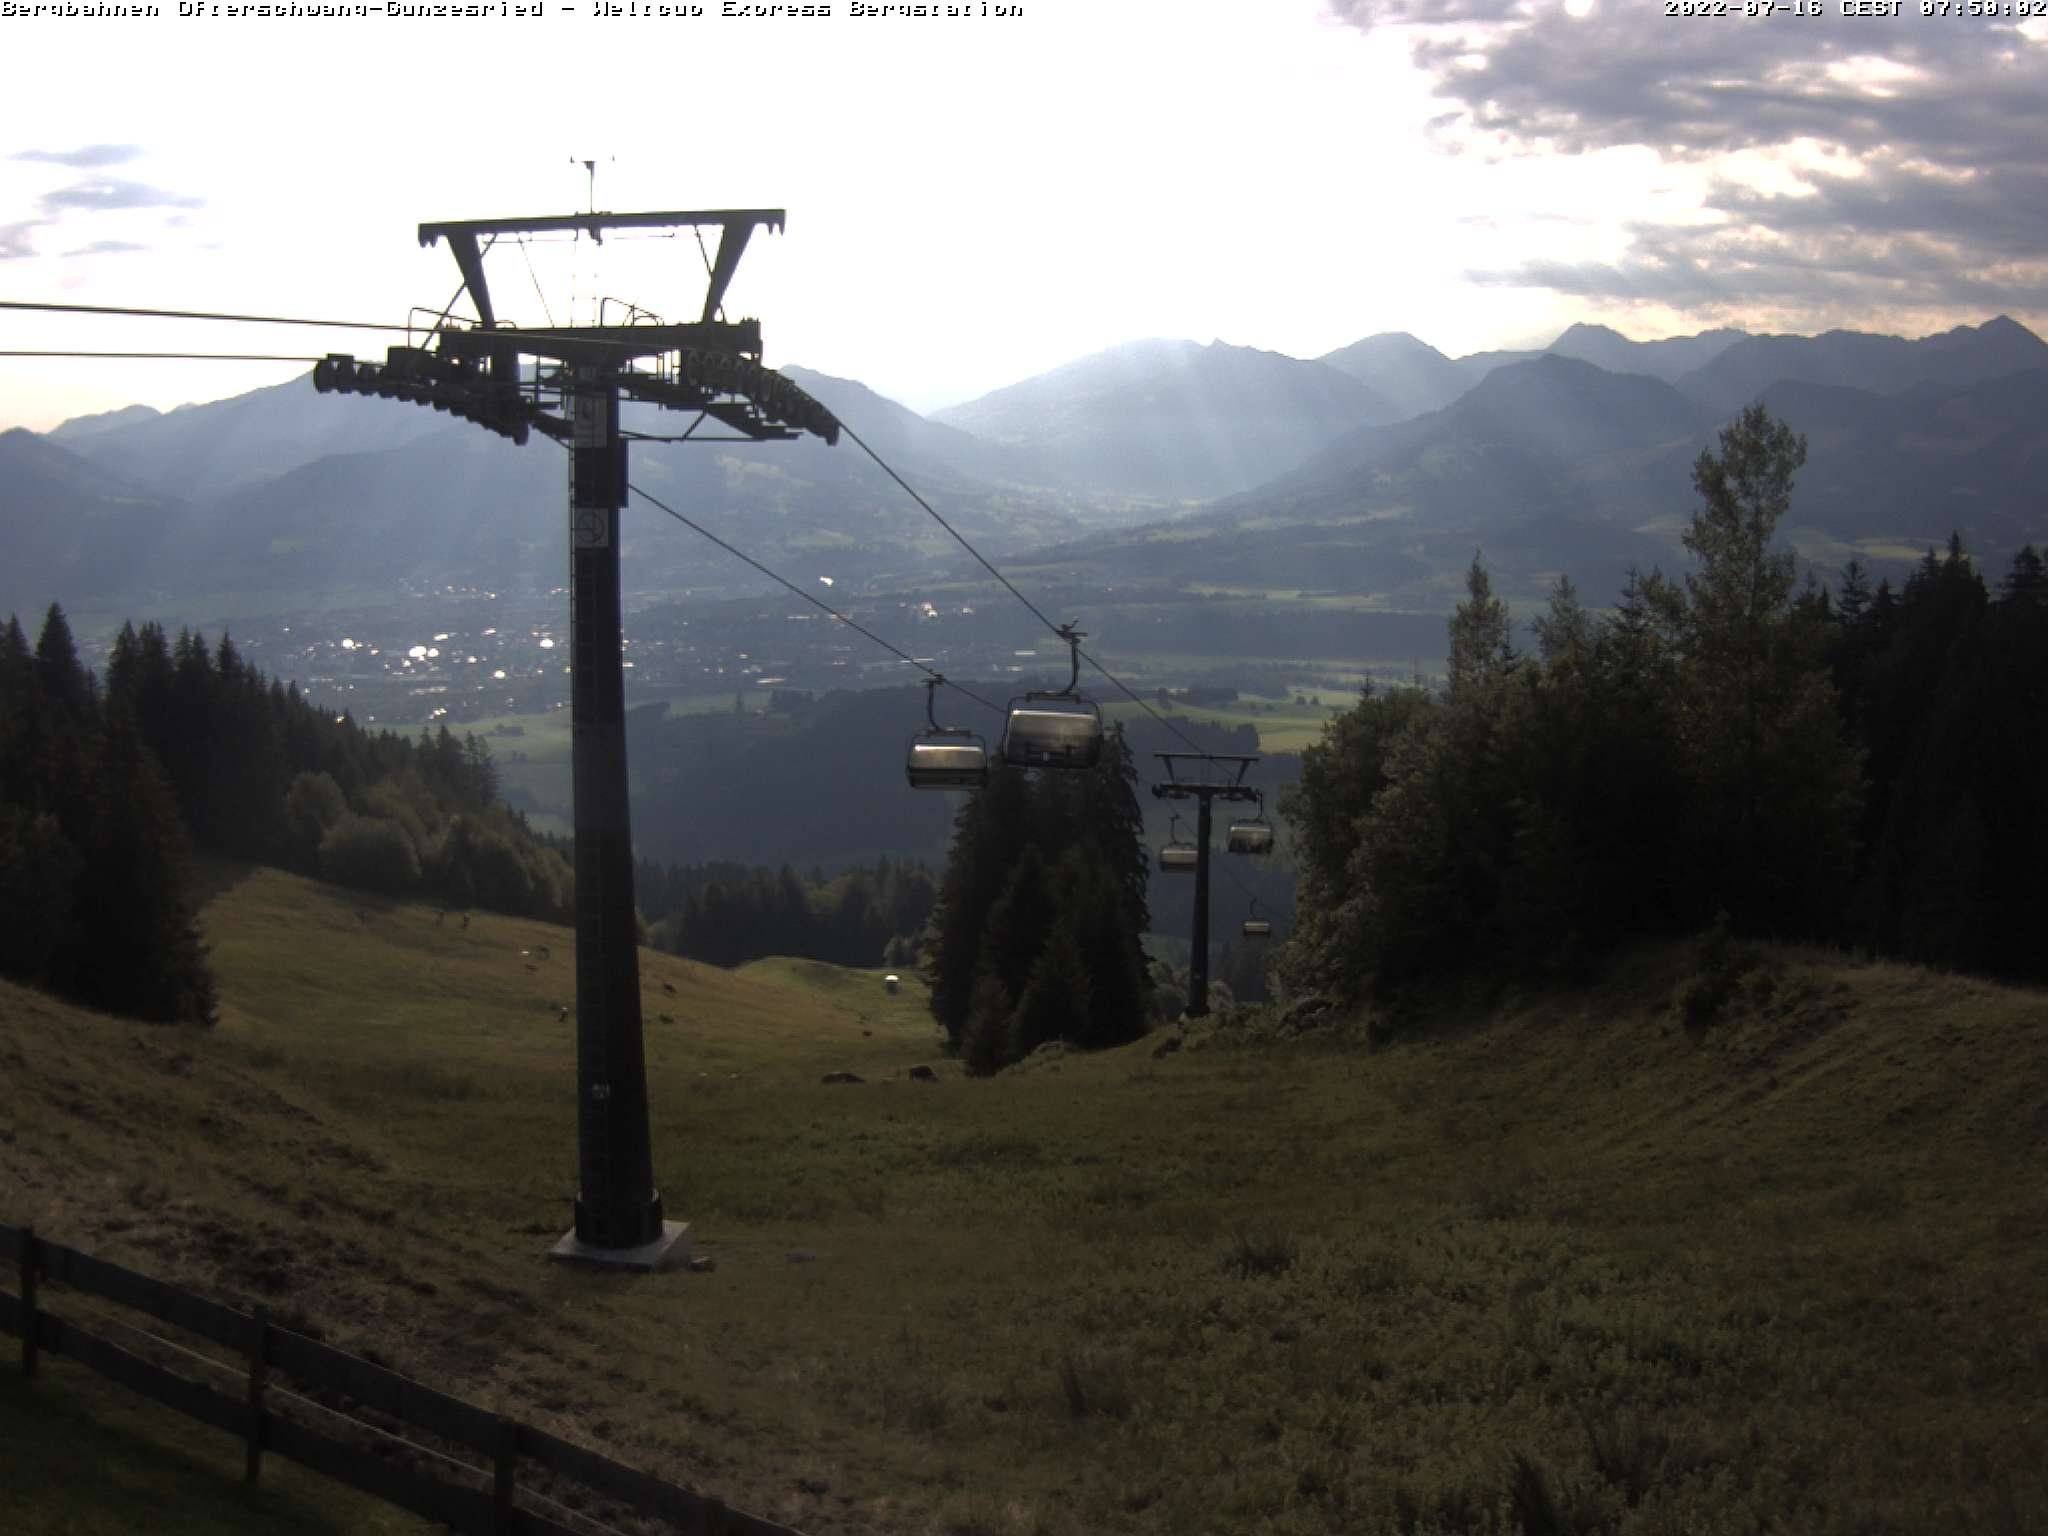 Webcam-Bild: Webcam - Bergstation Weltcup-Express